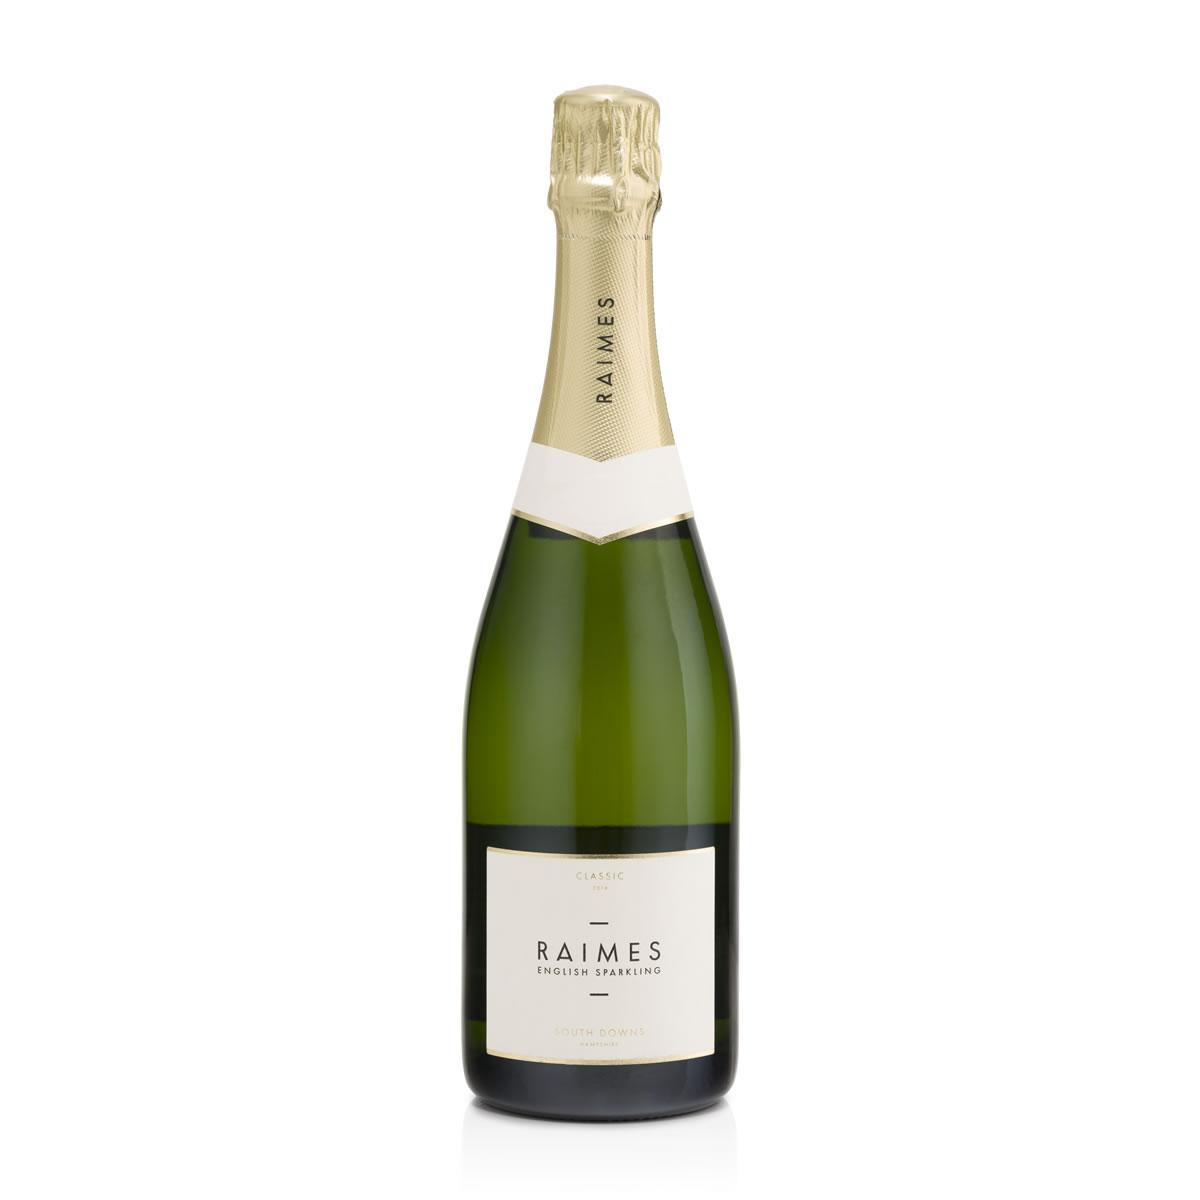 2015 Vintage Classic - Raimes English Sparkling Wine